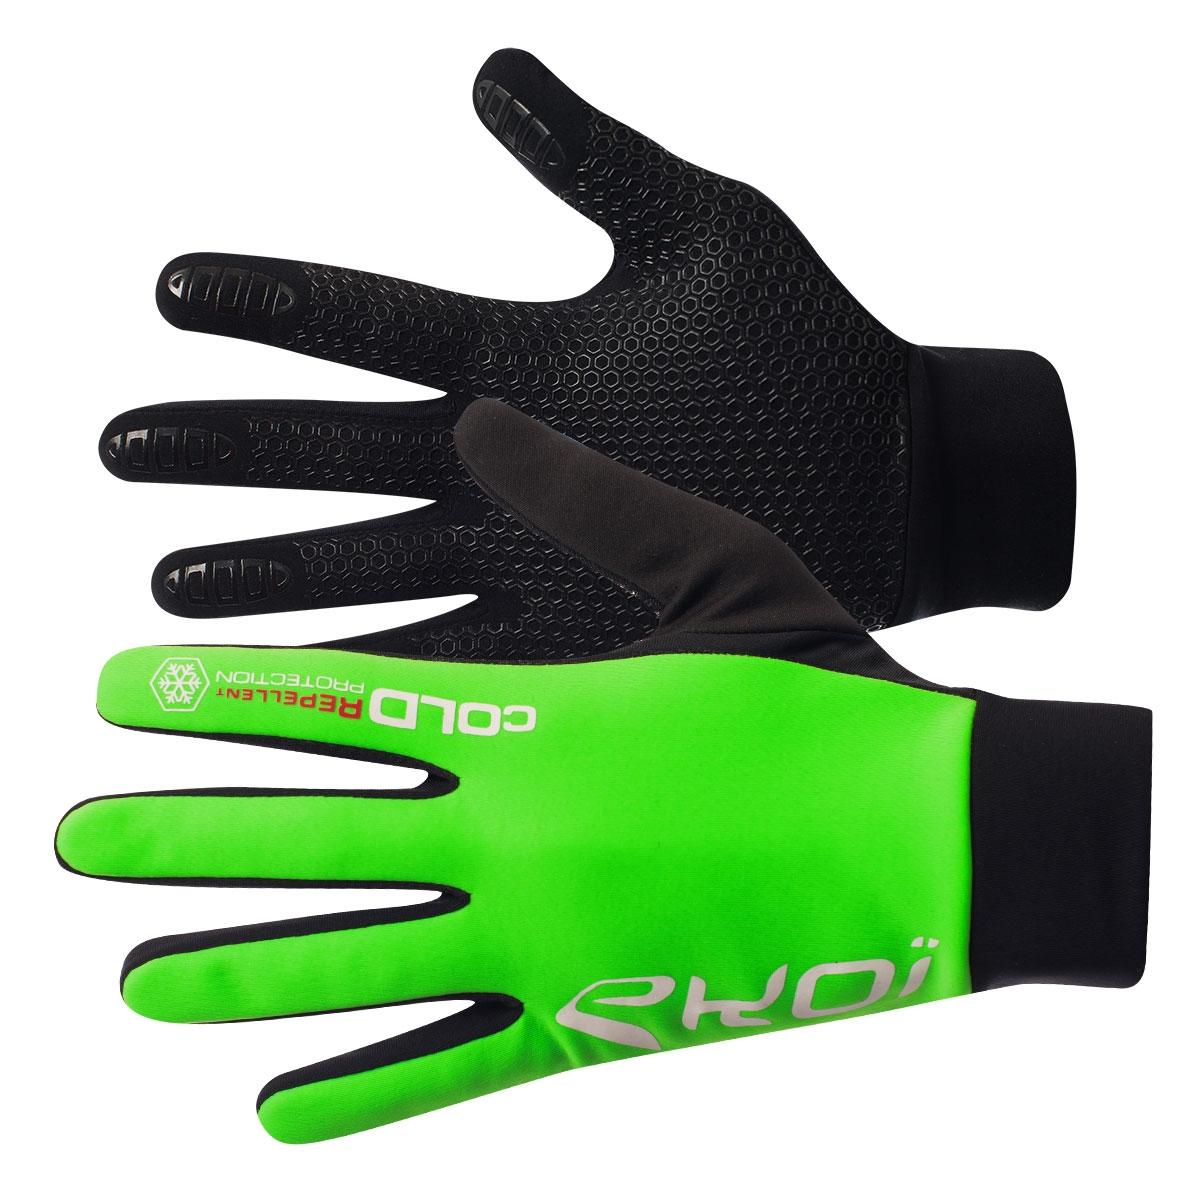 EKOI Fluo green Cold 2 winter gloves